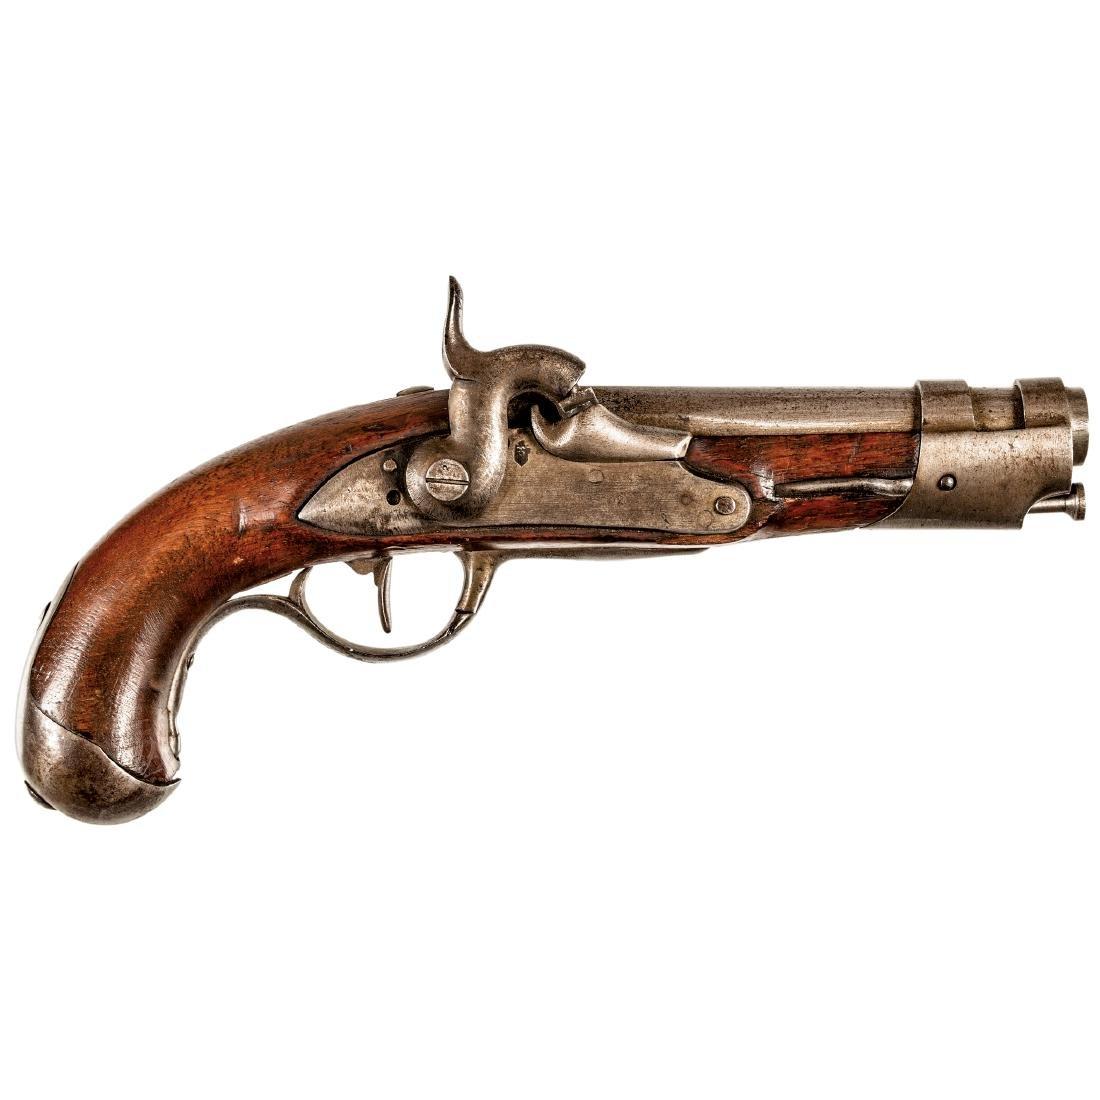 c 1802 French Military Flintlock Pistol Model AN9